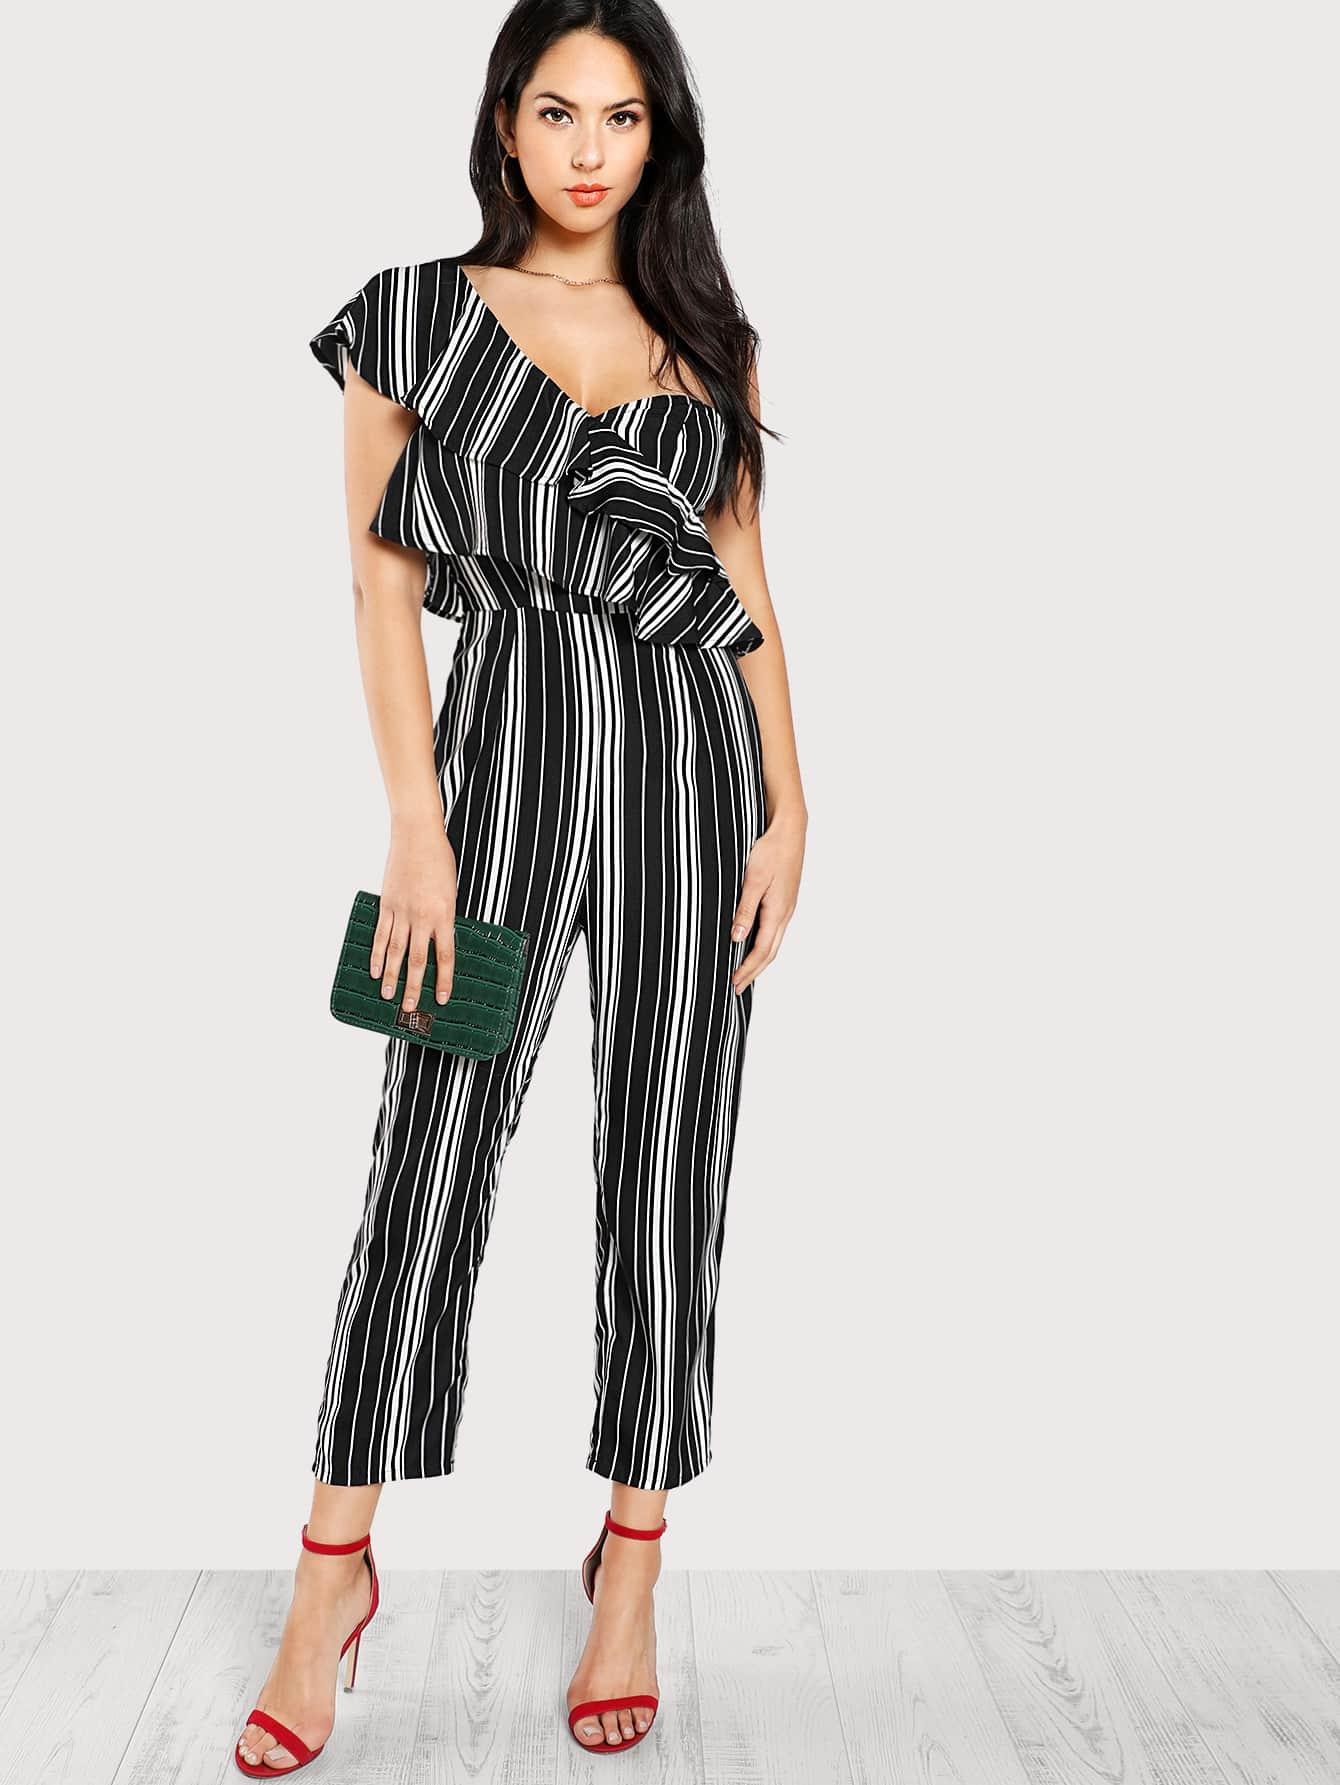 Asymmetrical Flounce Layered Shoulder Striped Jumpsuit black one shoulder frill layered design jumpsuit